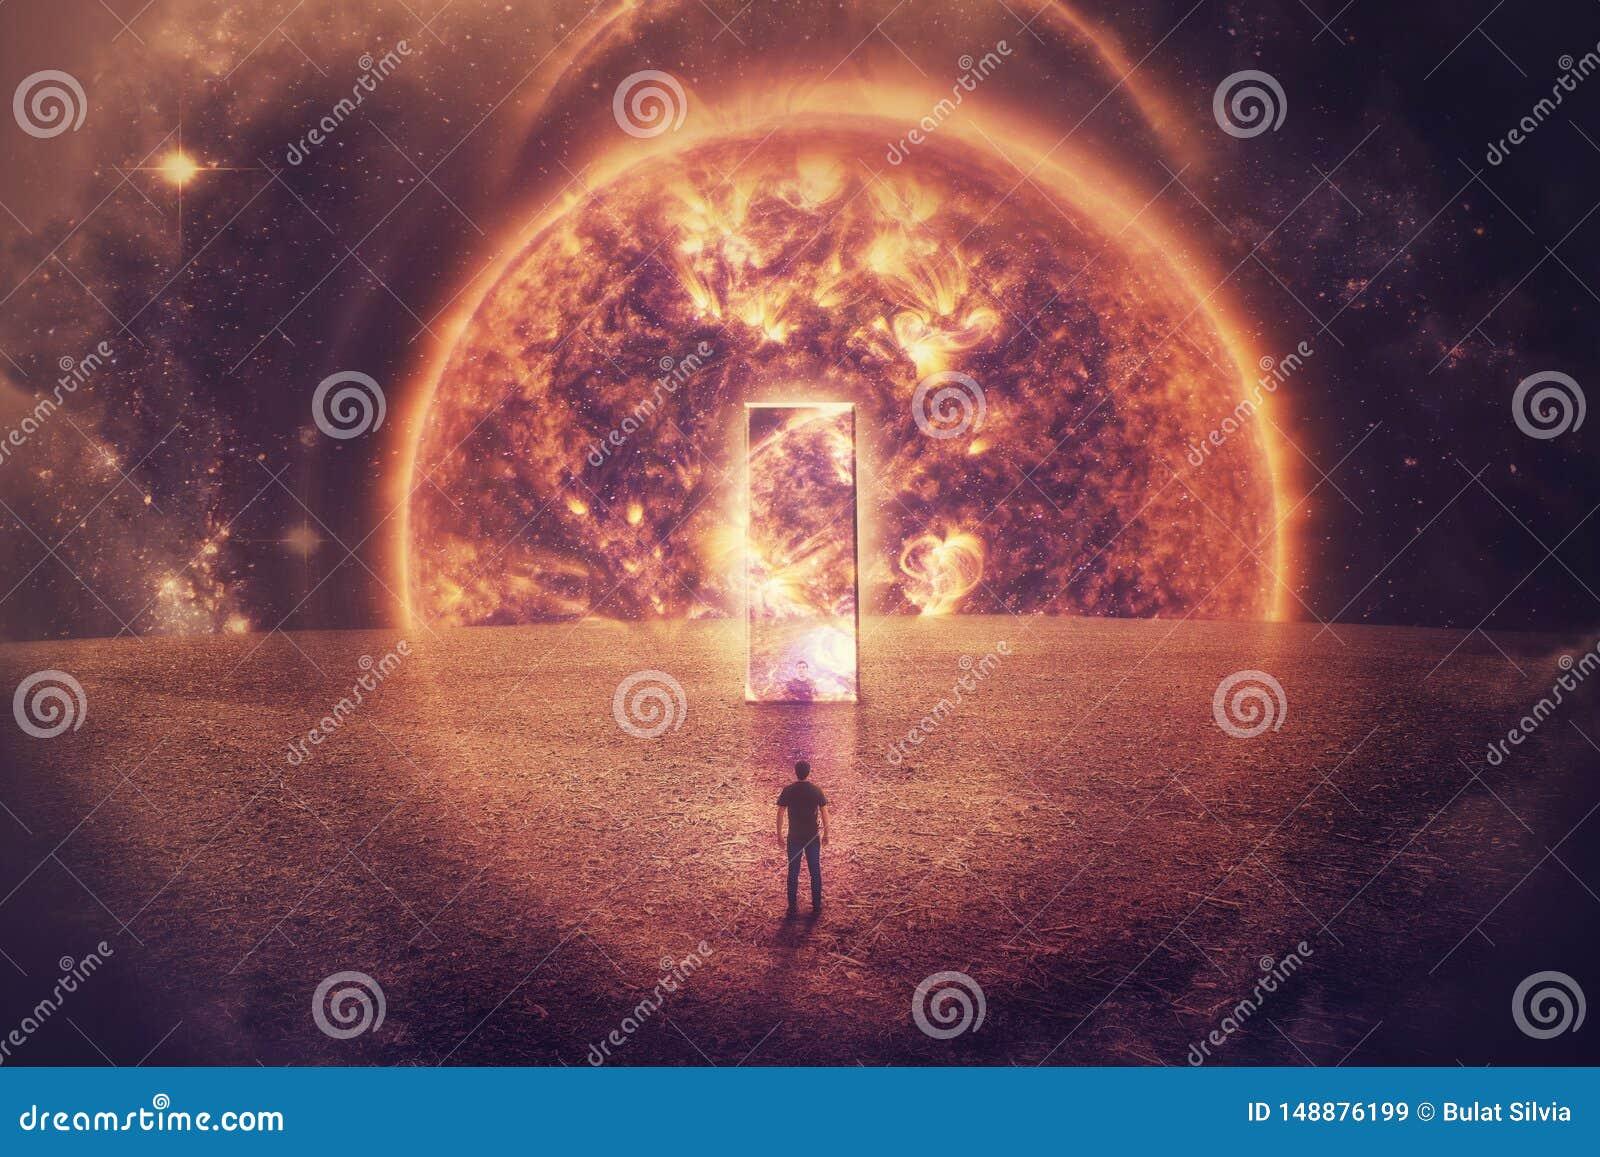 Mankonturn st?r framme av en enorm spegeld?rr p? en imagin?r planet